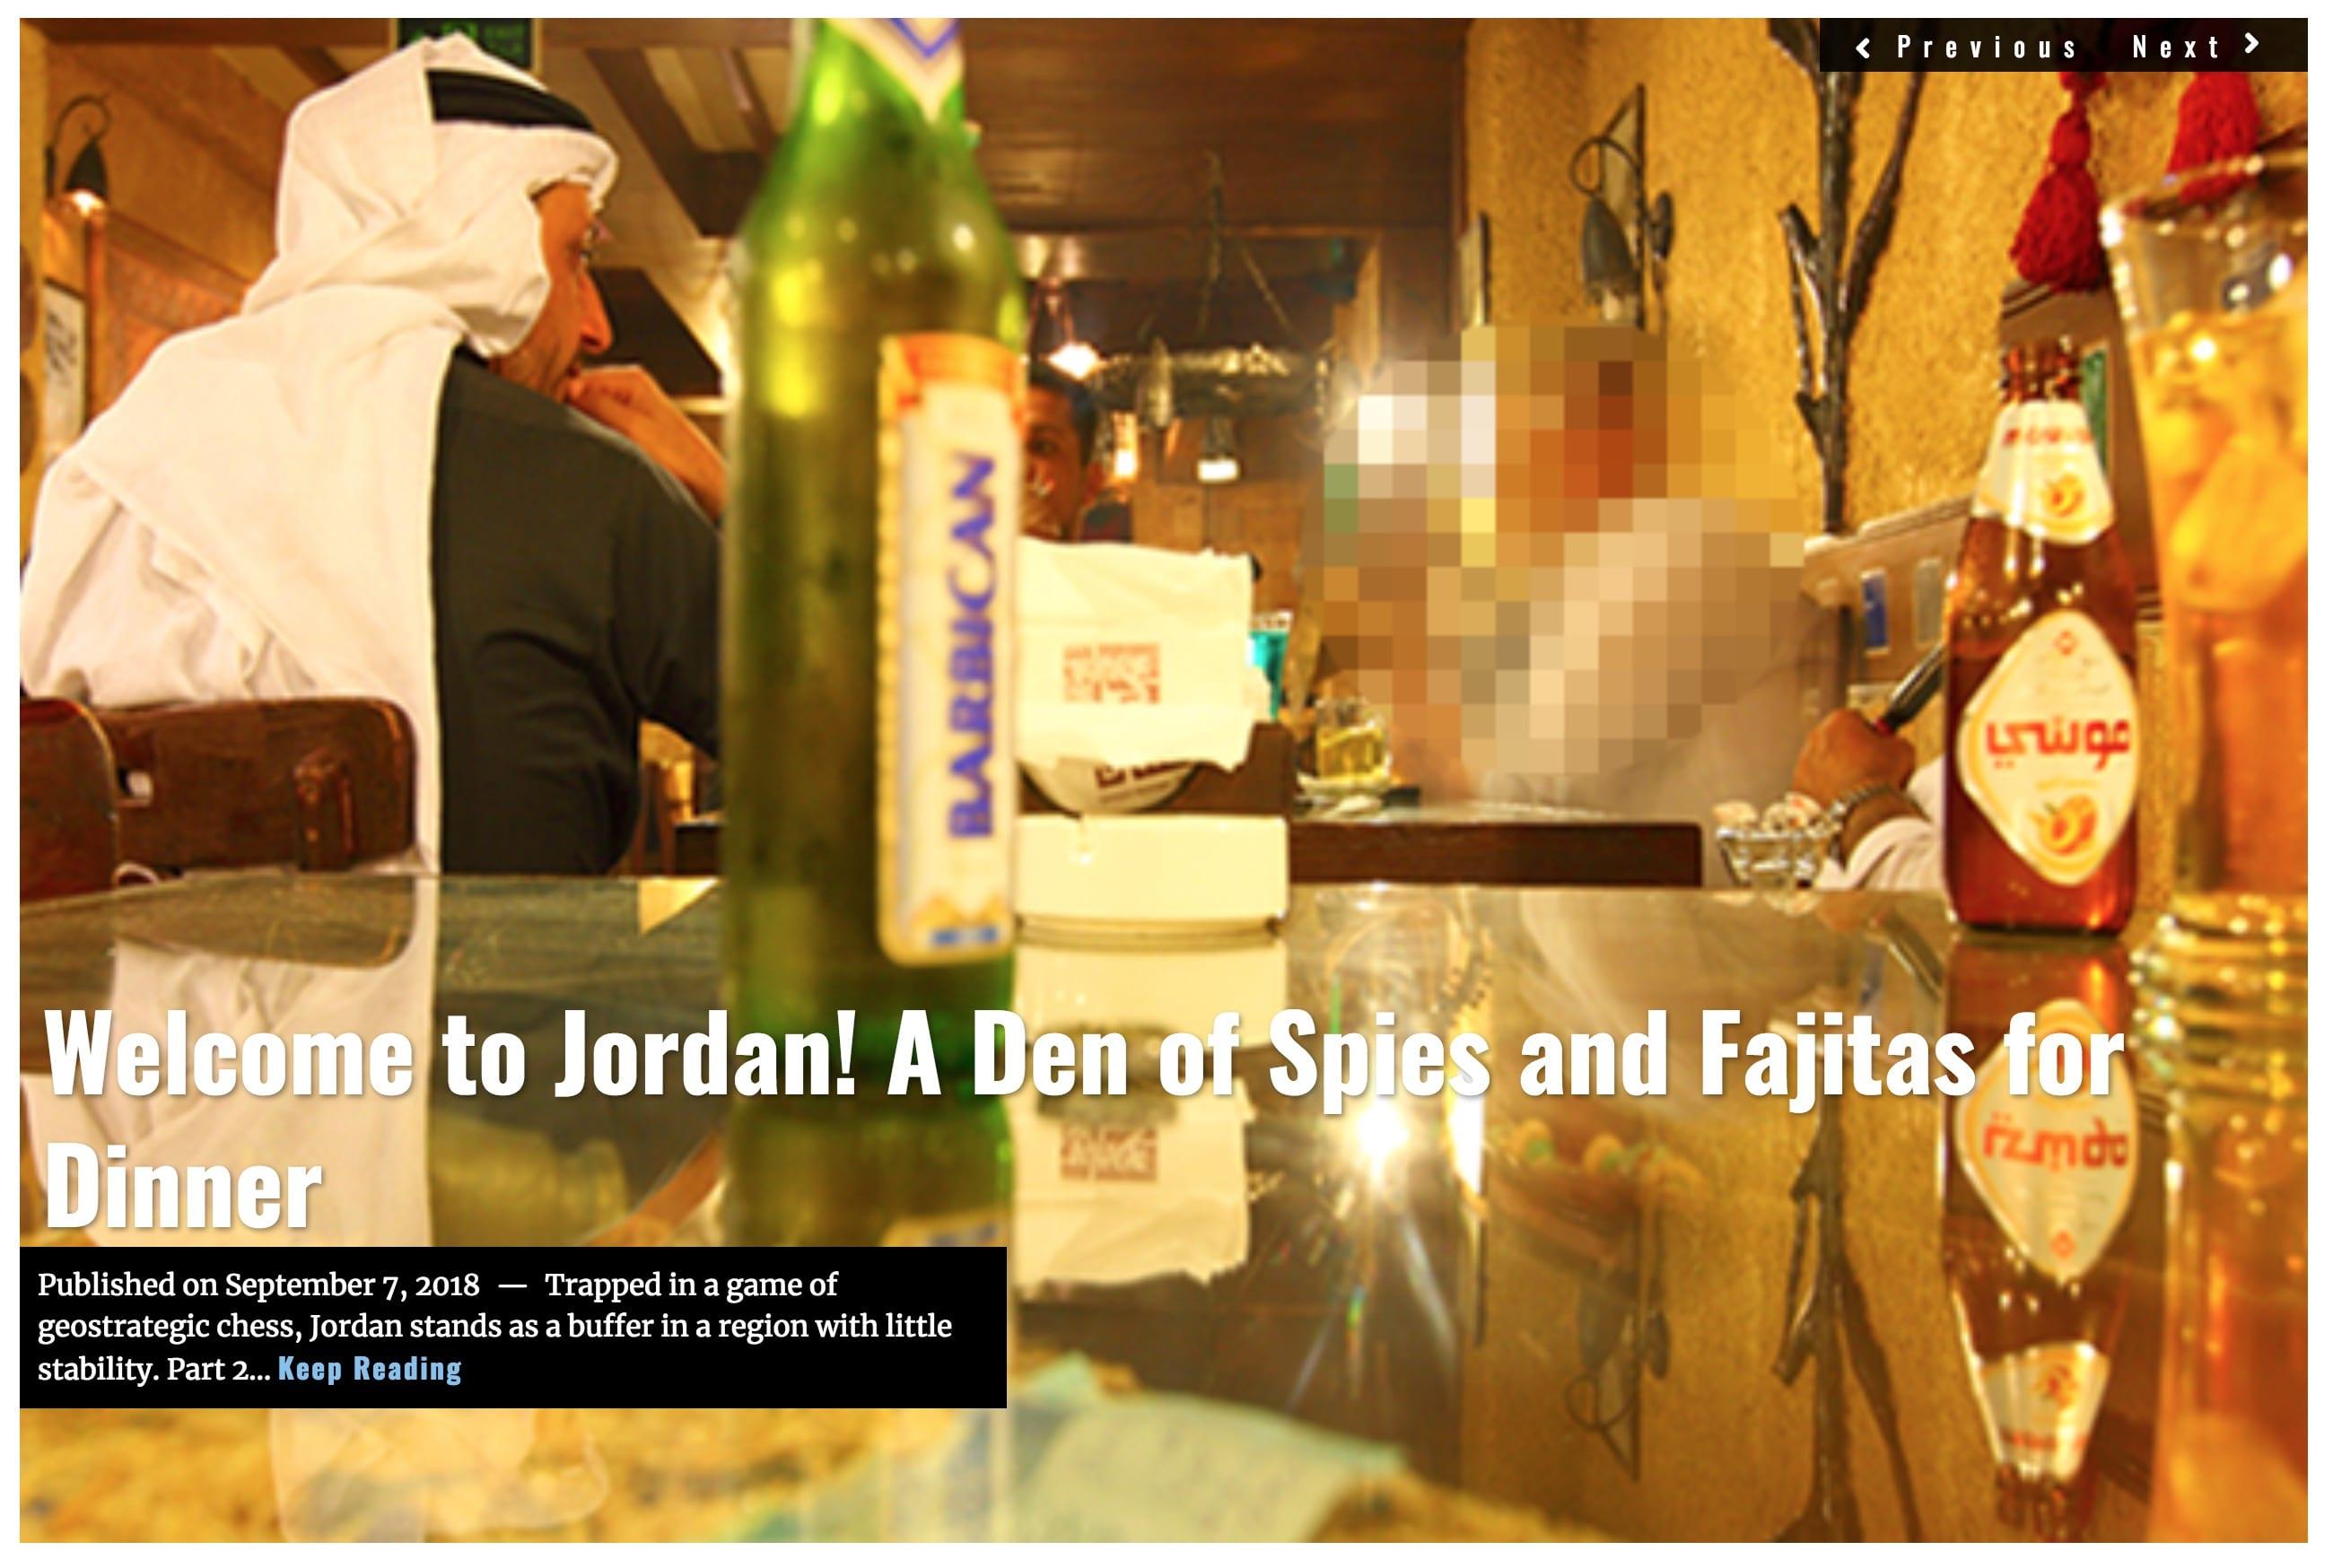 Image Lima Charlie News Headline Welcome to Jordan SEPT 7 2018